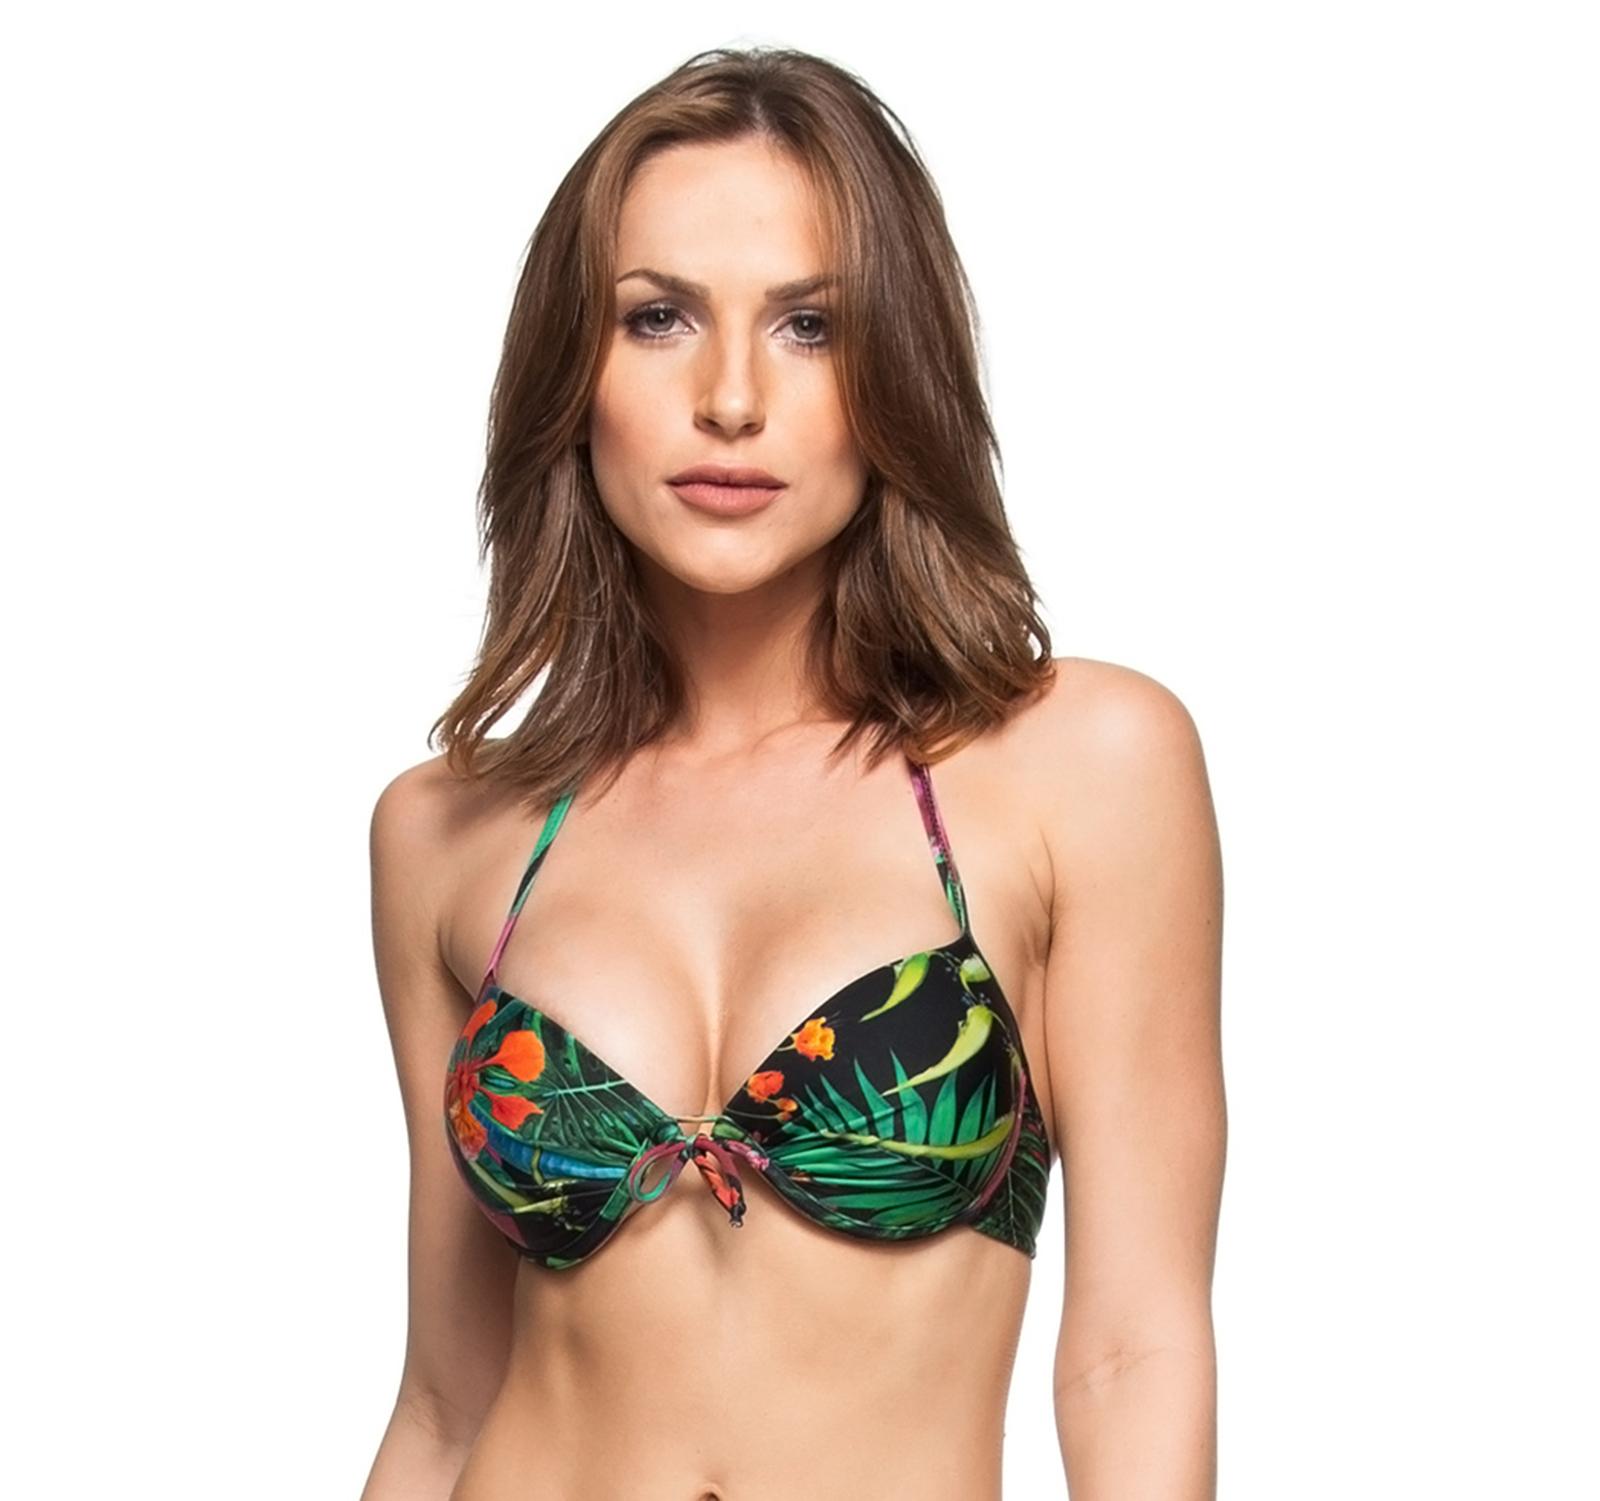 03b2c74873 Black push-up bikini top with underwire and tropical print - TOP AGUAS DE  CUBA ...